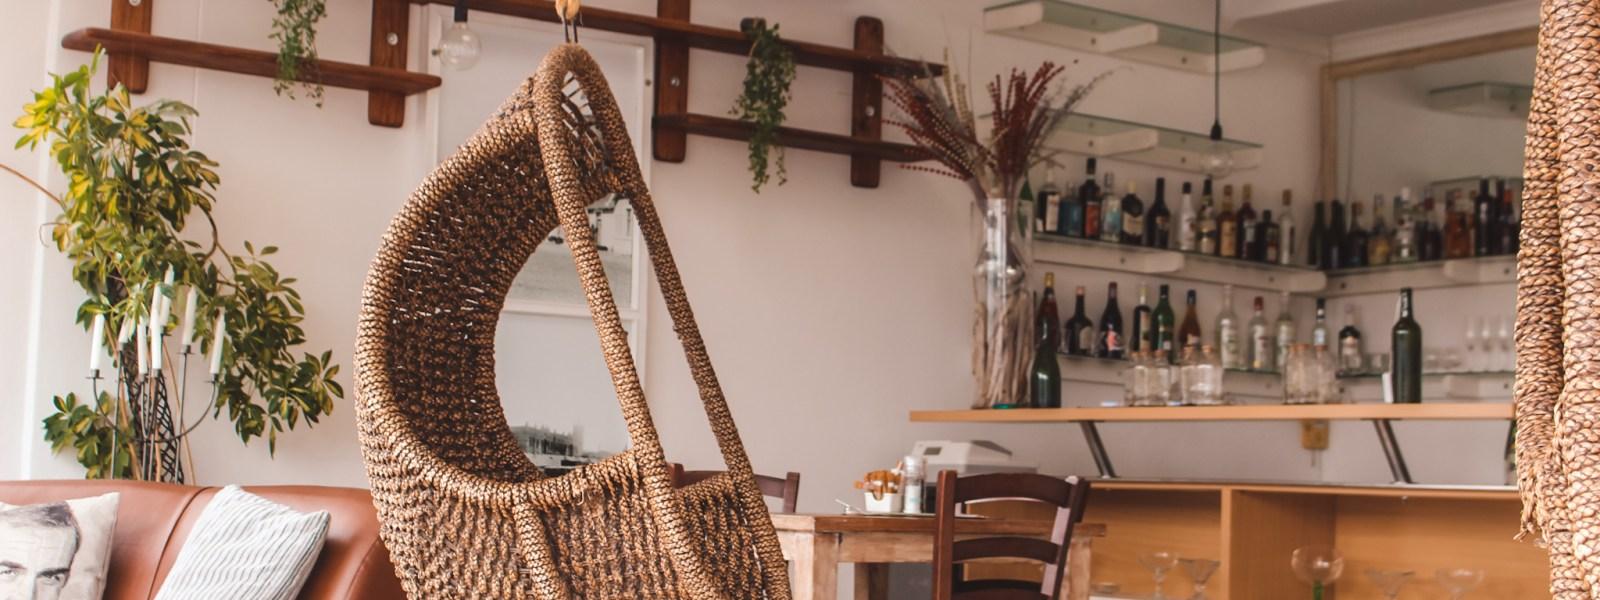 10x hotspots, koffie en restaurants in Swakopmund